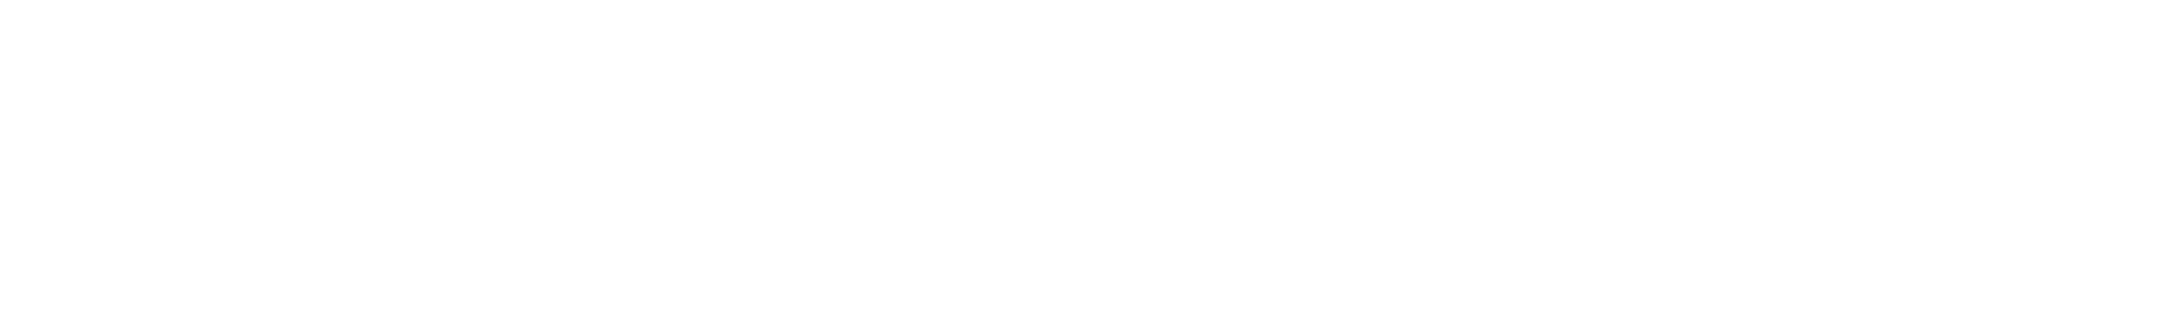 BE MenA Awards 2020 Logo Website5